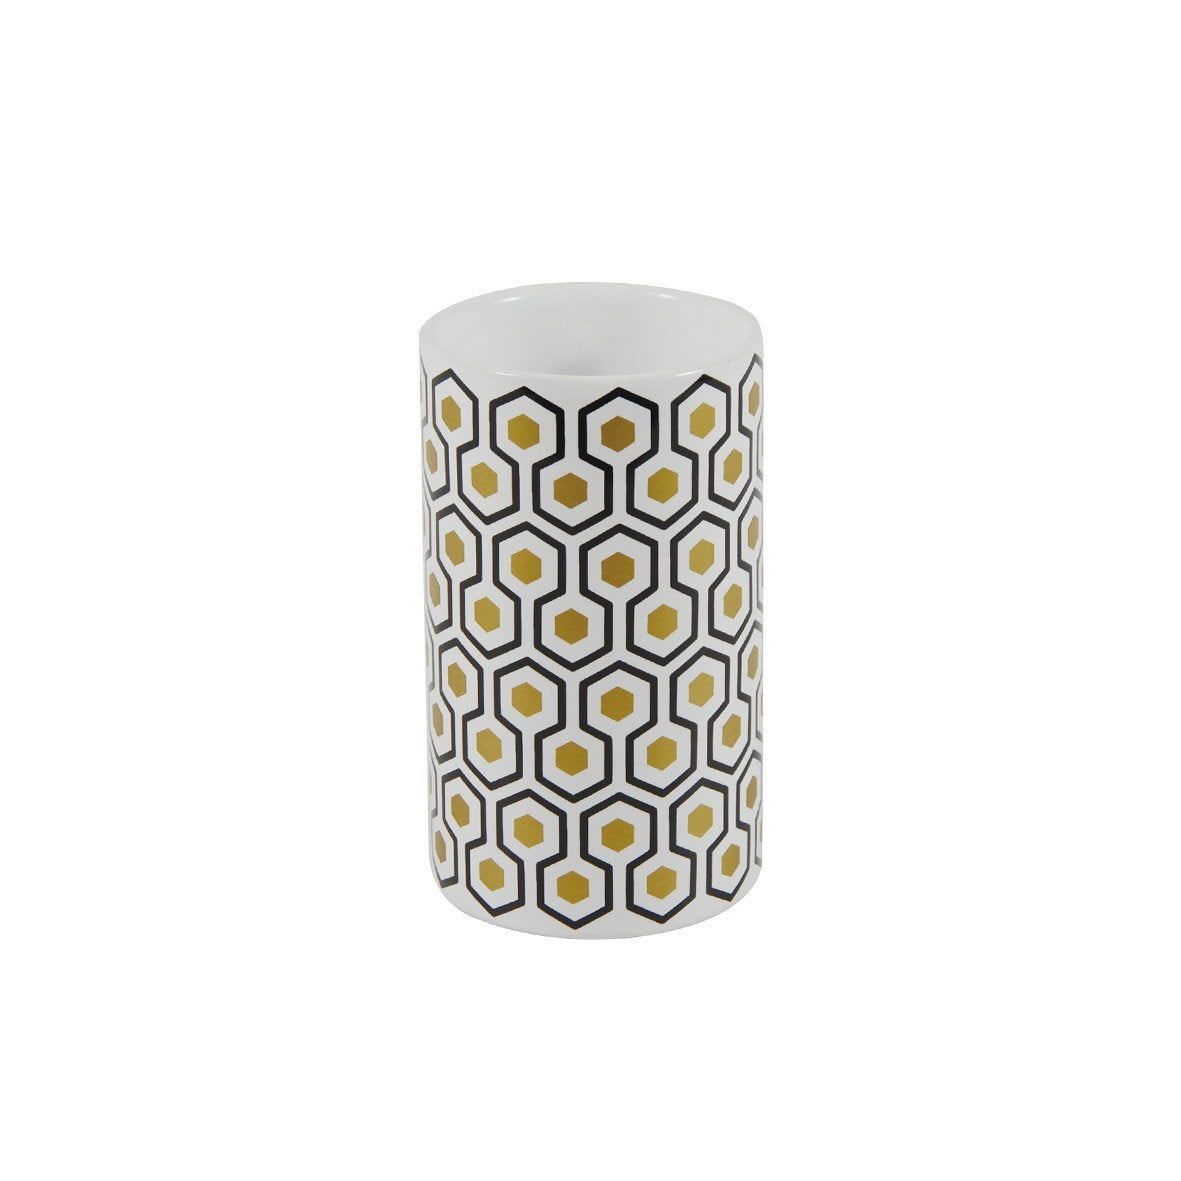 Gobelet céramique Carlton, blanc, noir et or